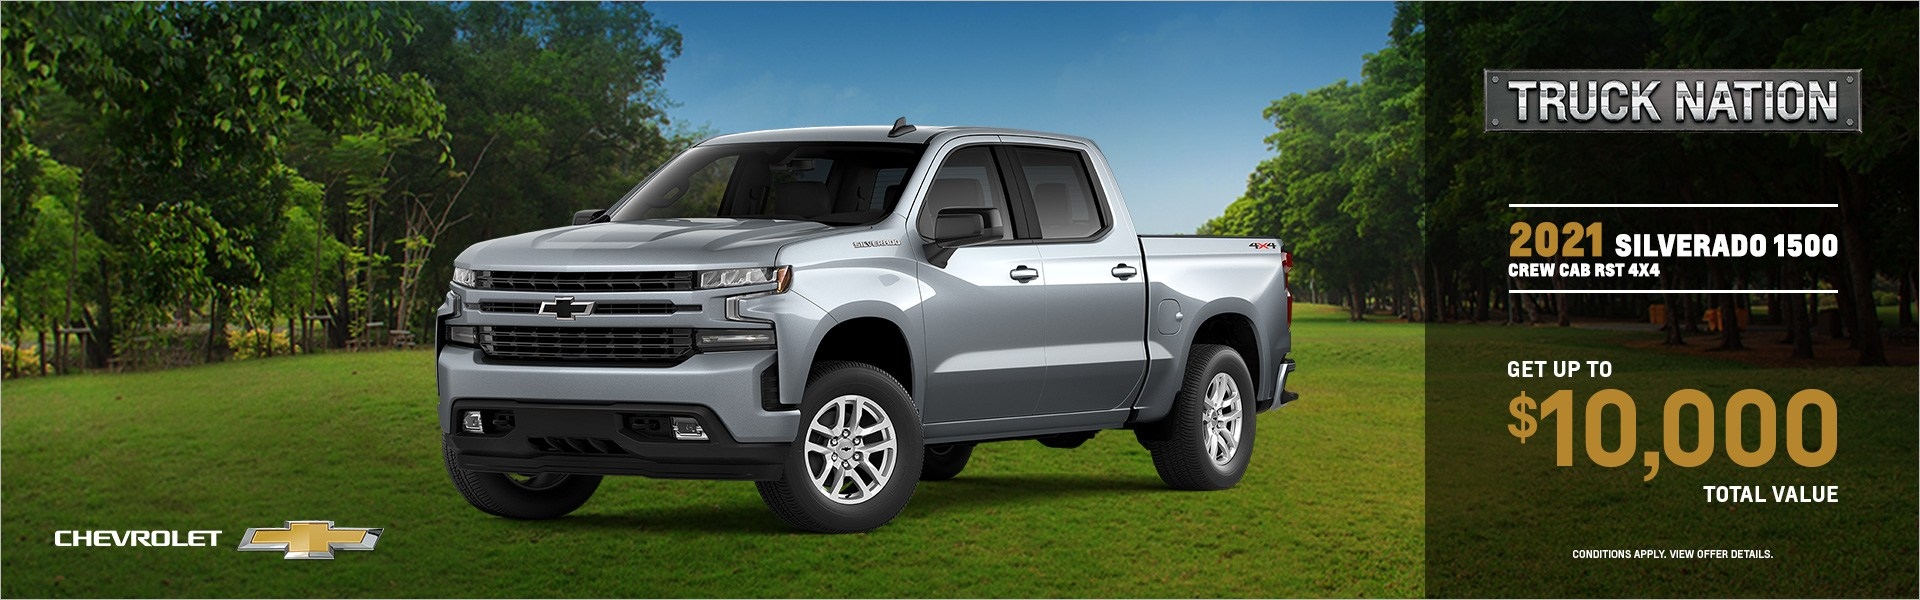 Silverado Truck Nation May Promotion